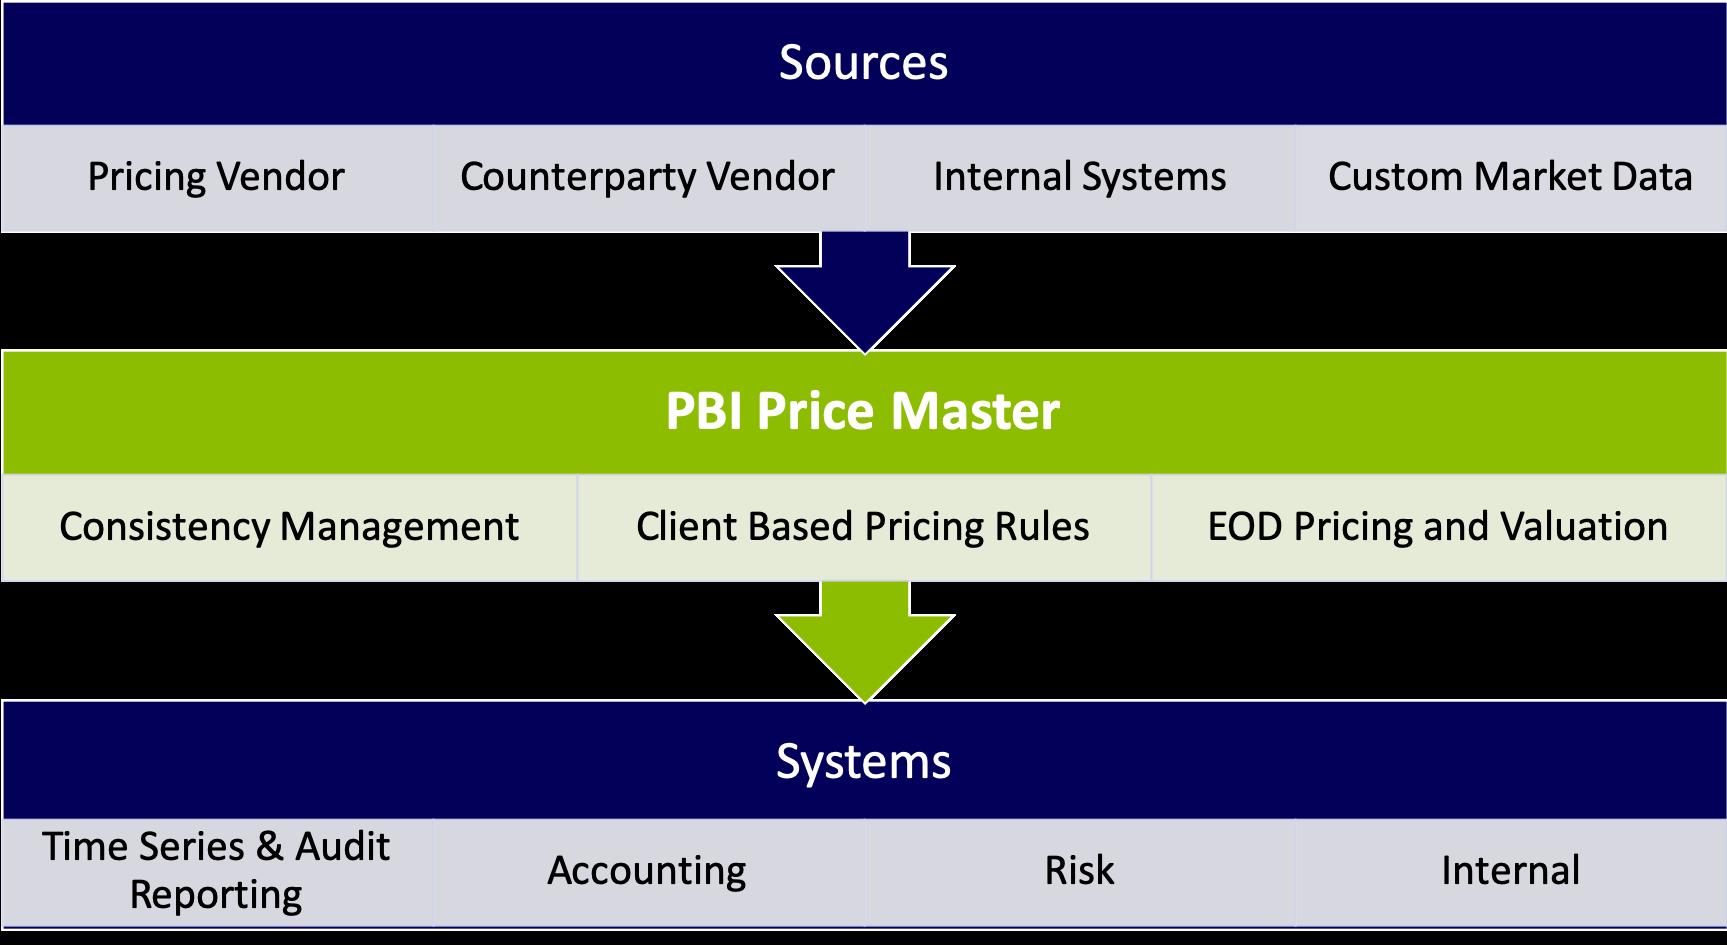 Portfolio BI price master diagram with organization workflow.